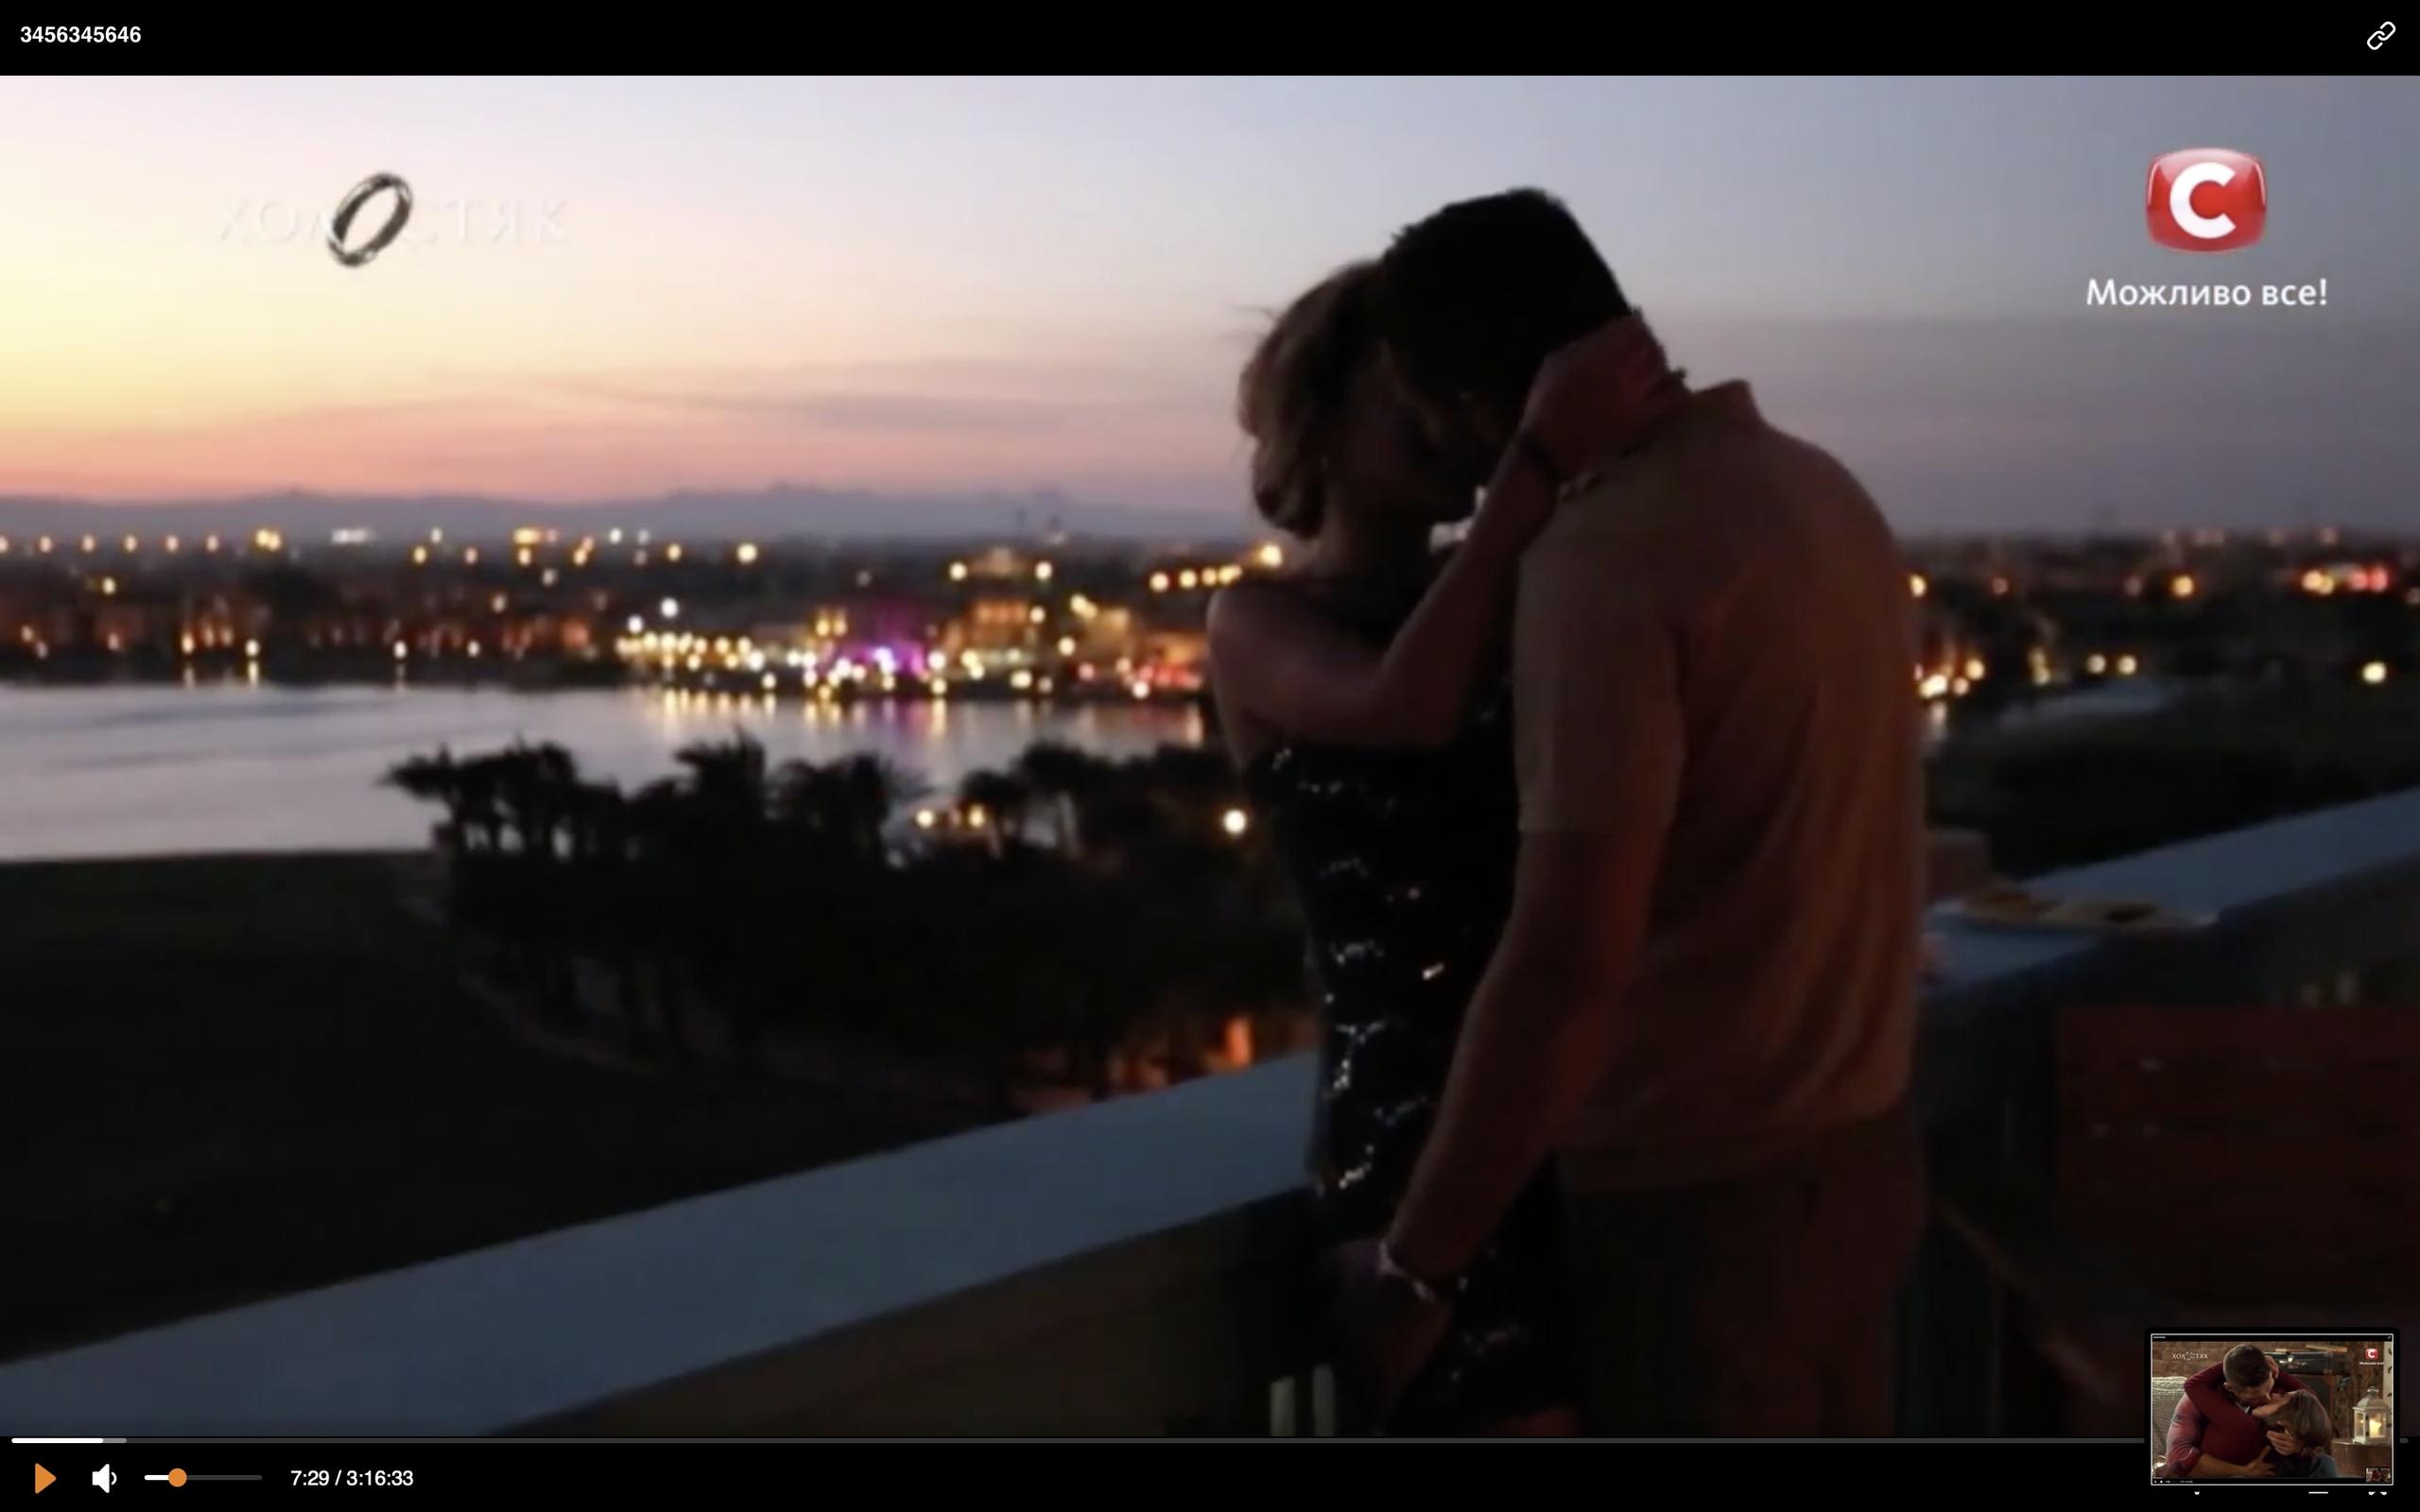 Bachelor Ukraine - Season 9 - Nikita Dobrynin - *Sleuthing Spoilers* - Page 10 5E9A67M2IlE